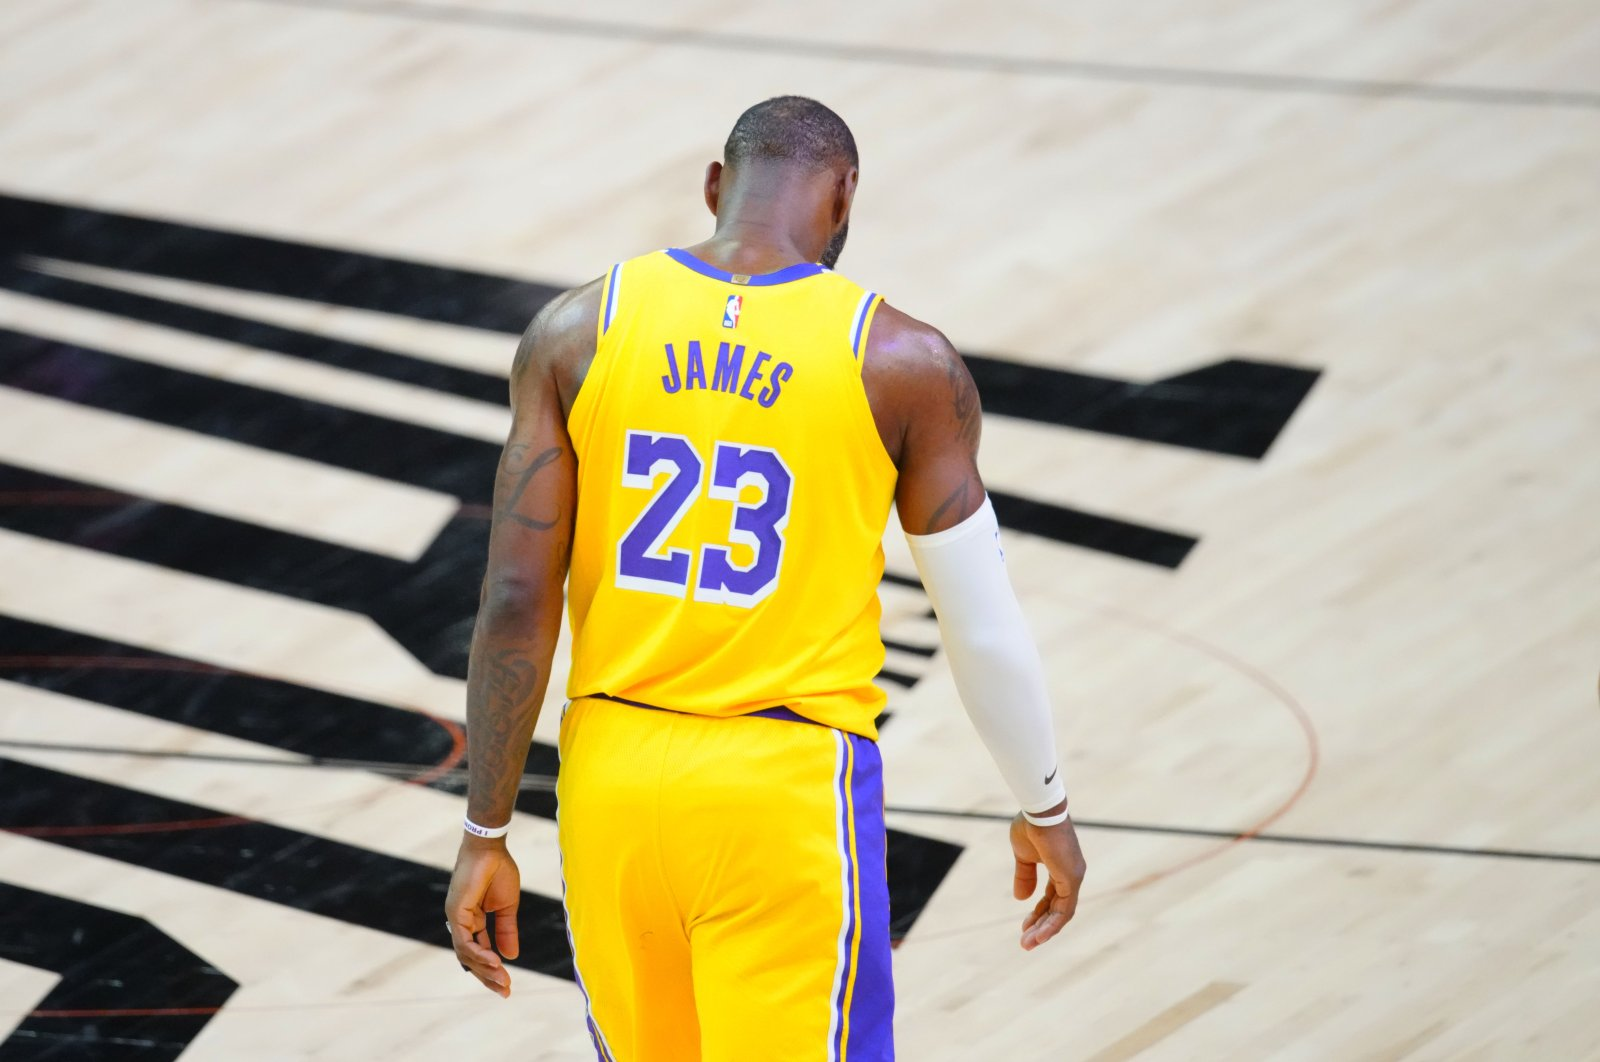 Los Angeles Lakers forward LeBron James during Game 5 NBA Playoffs match against the Phoenix Suns, Phoenix, Arizona, U.S., Jun 1, 2021.